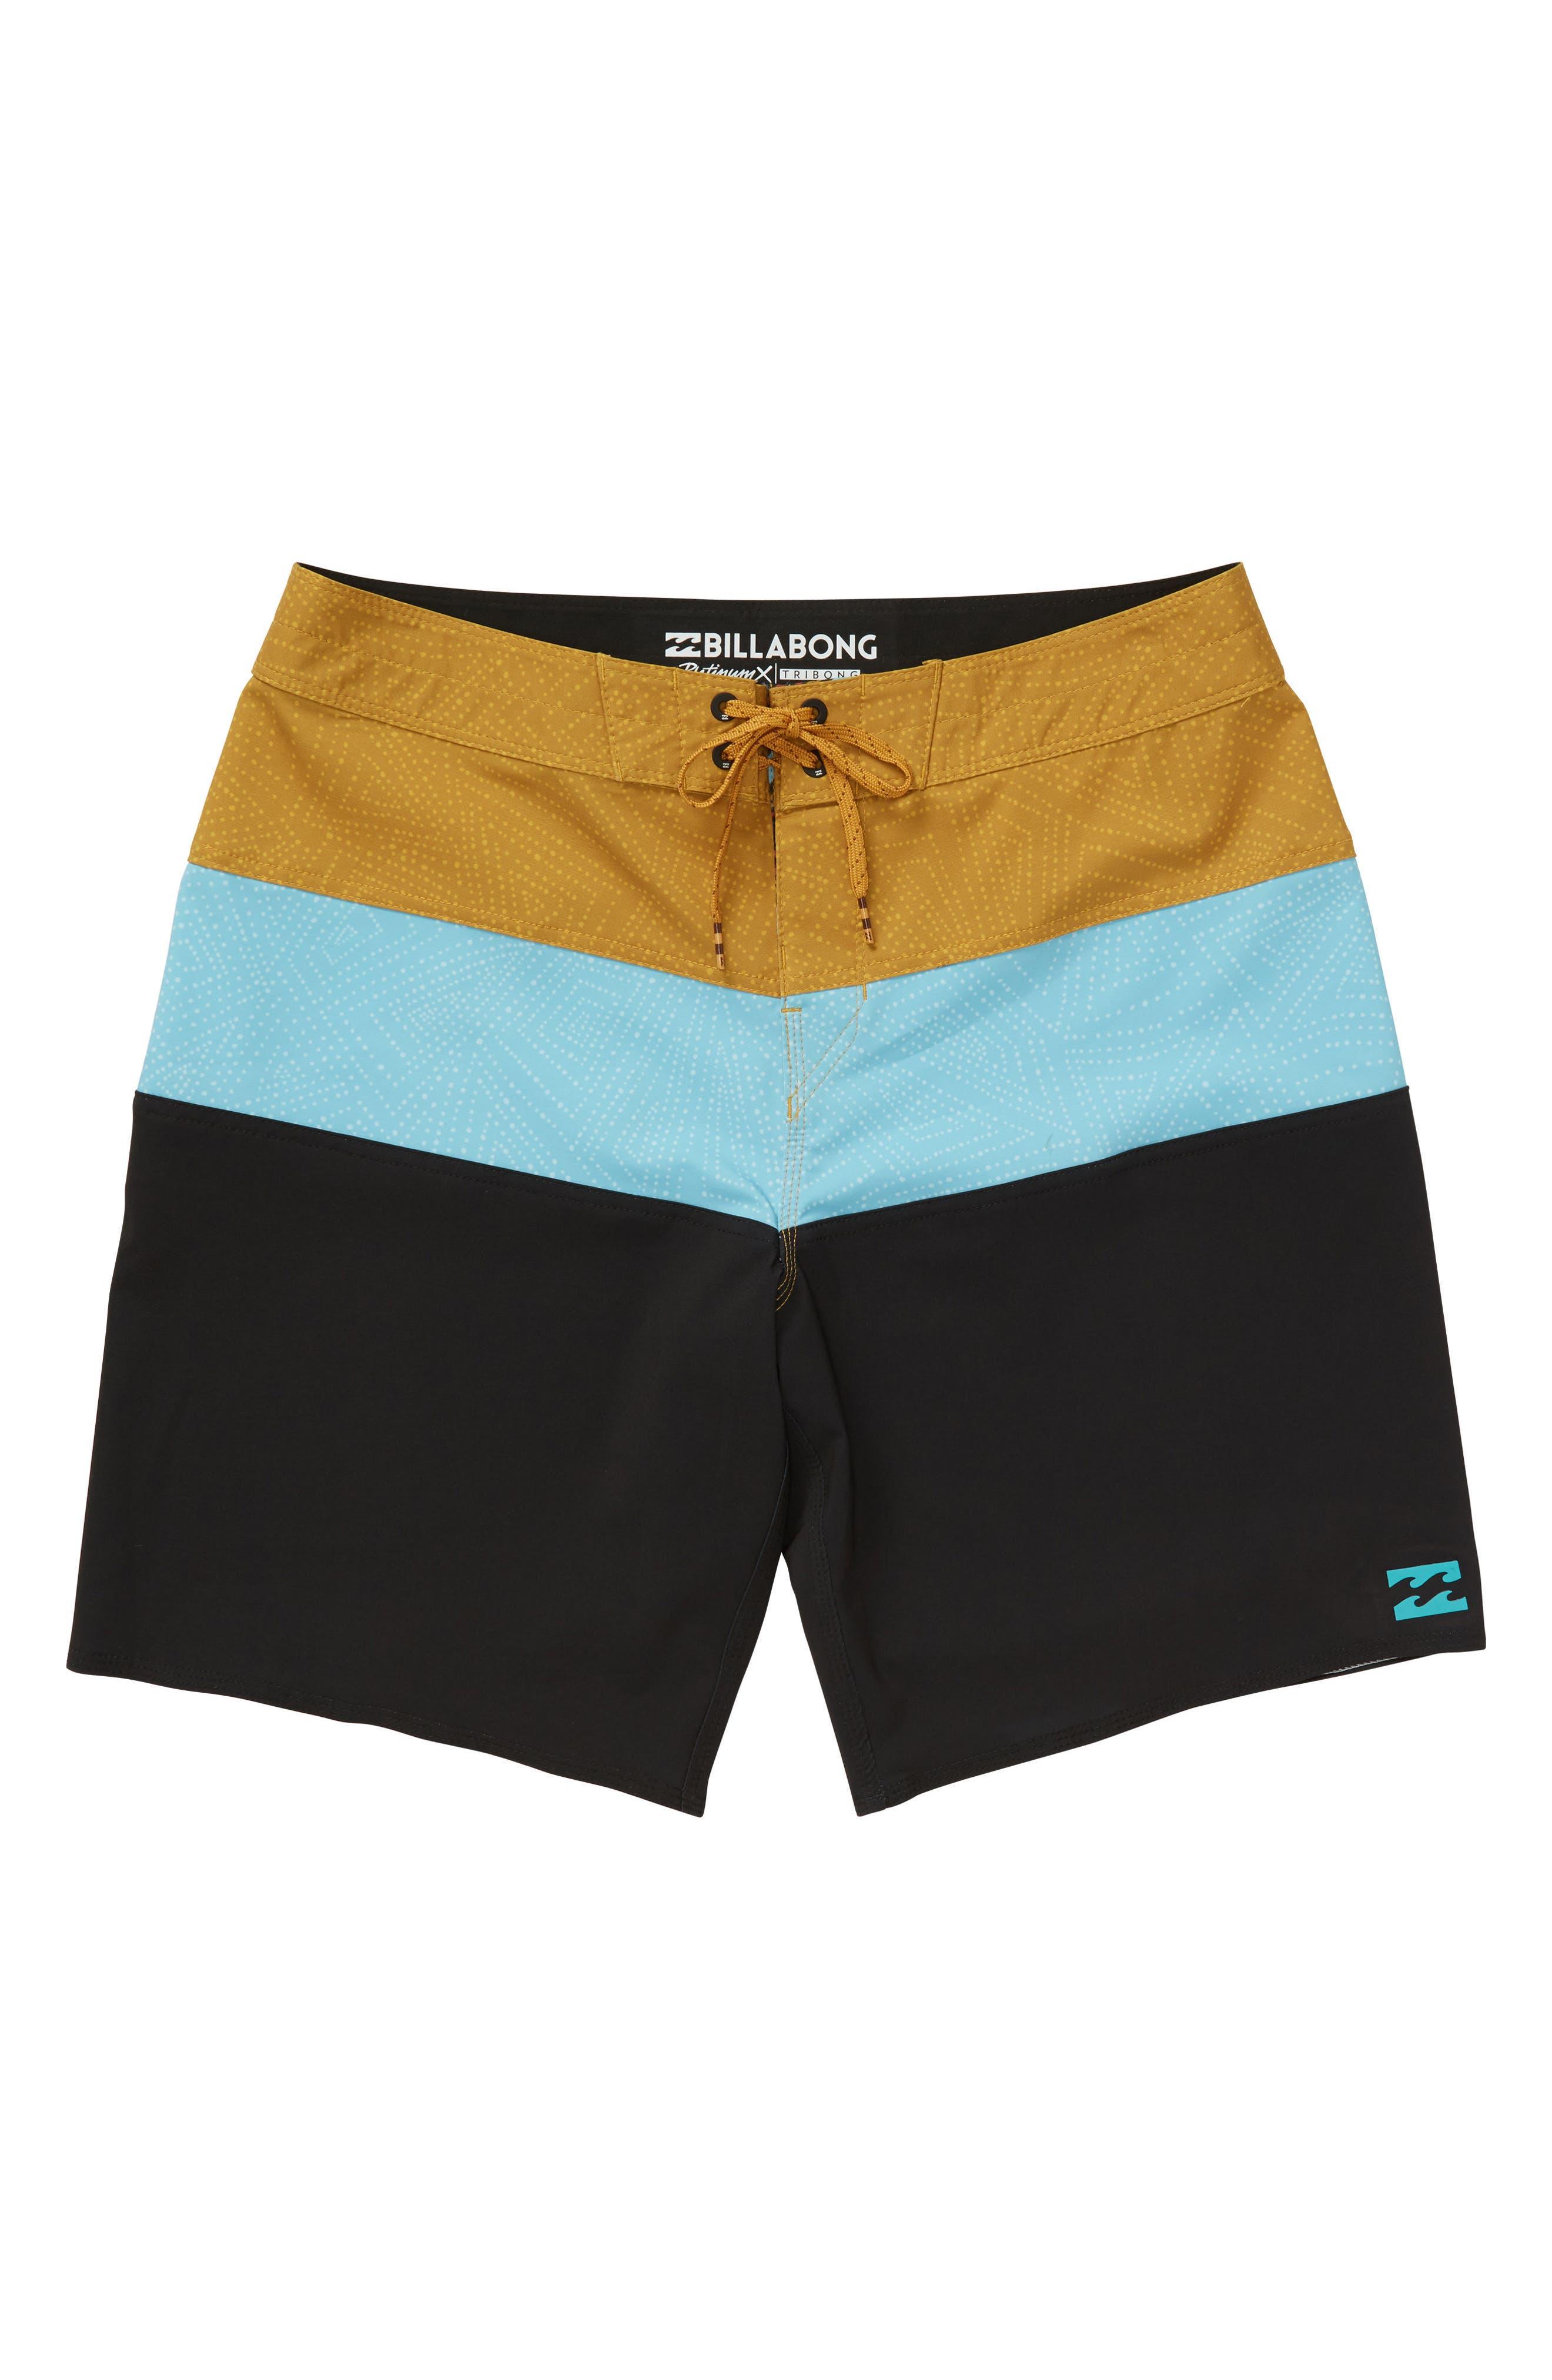 Tribong X Board Shorts,                             Main thumbnail 1, color,                             Aqua